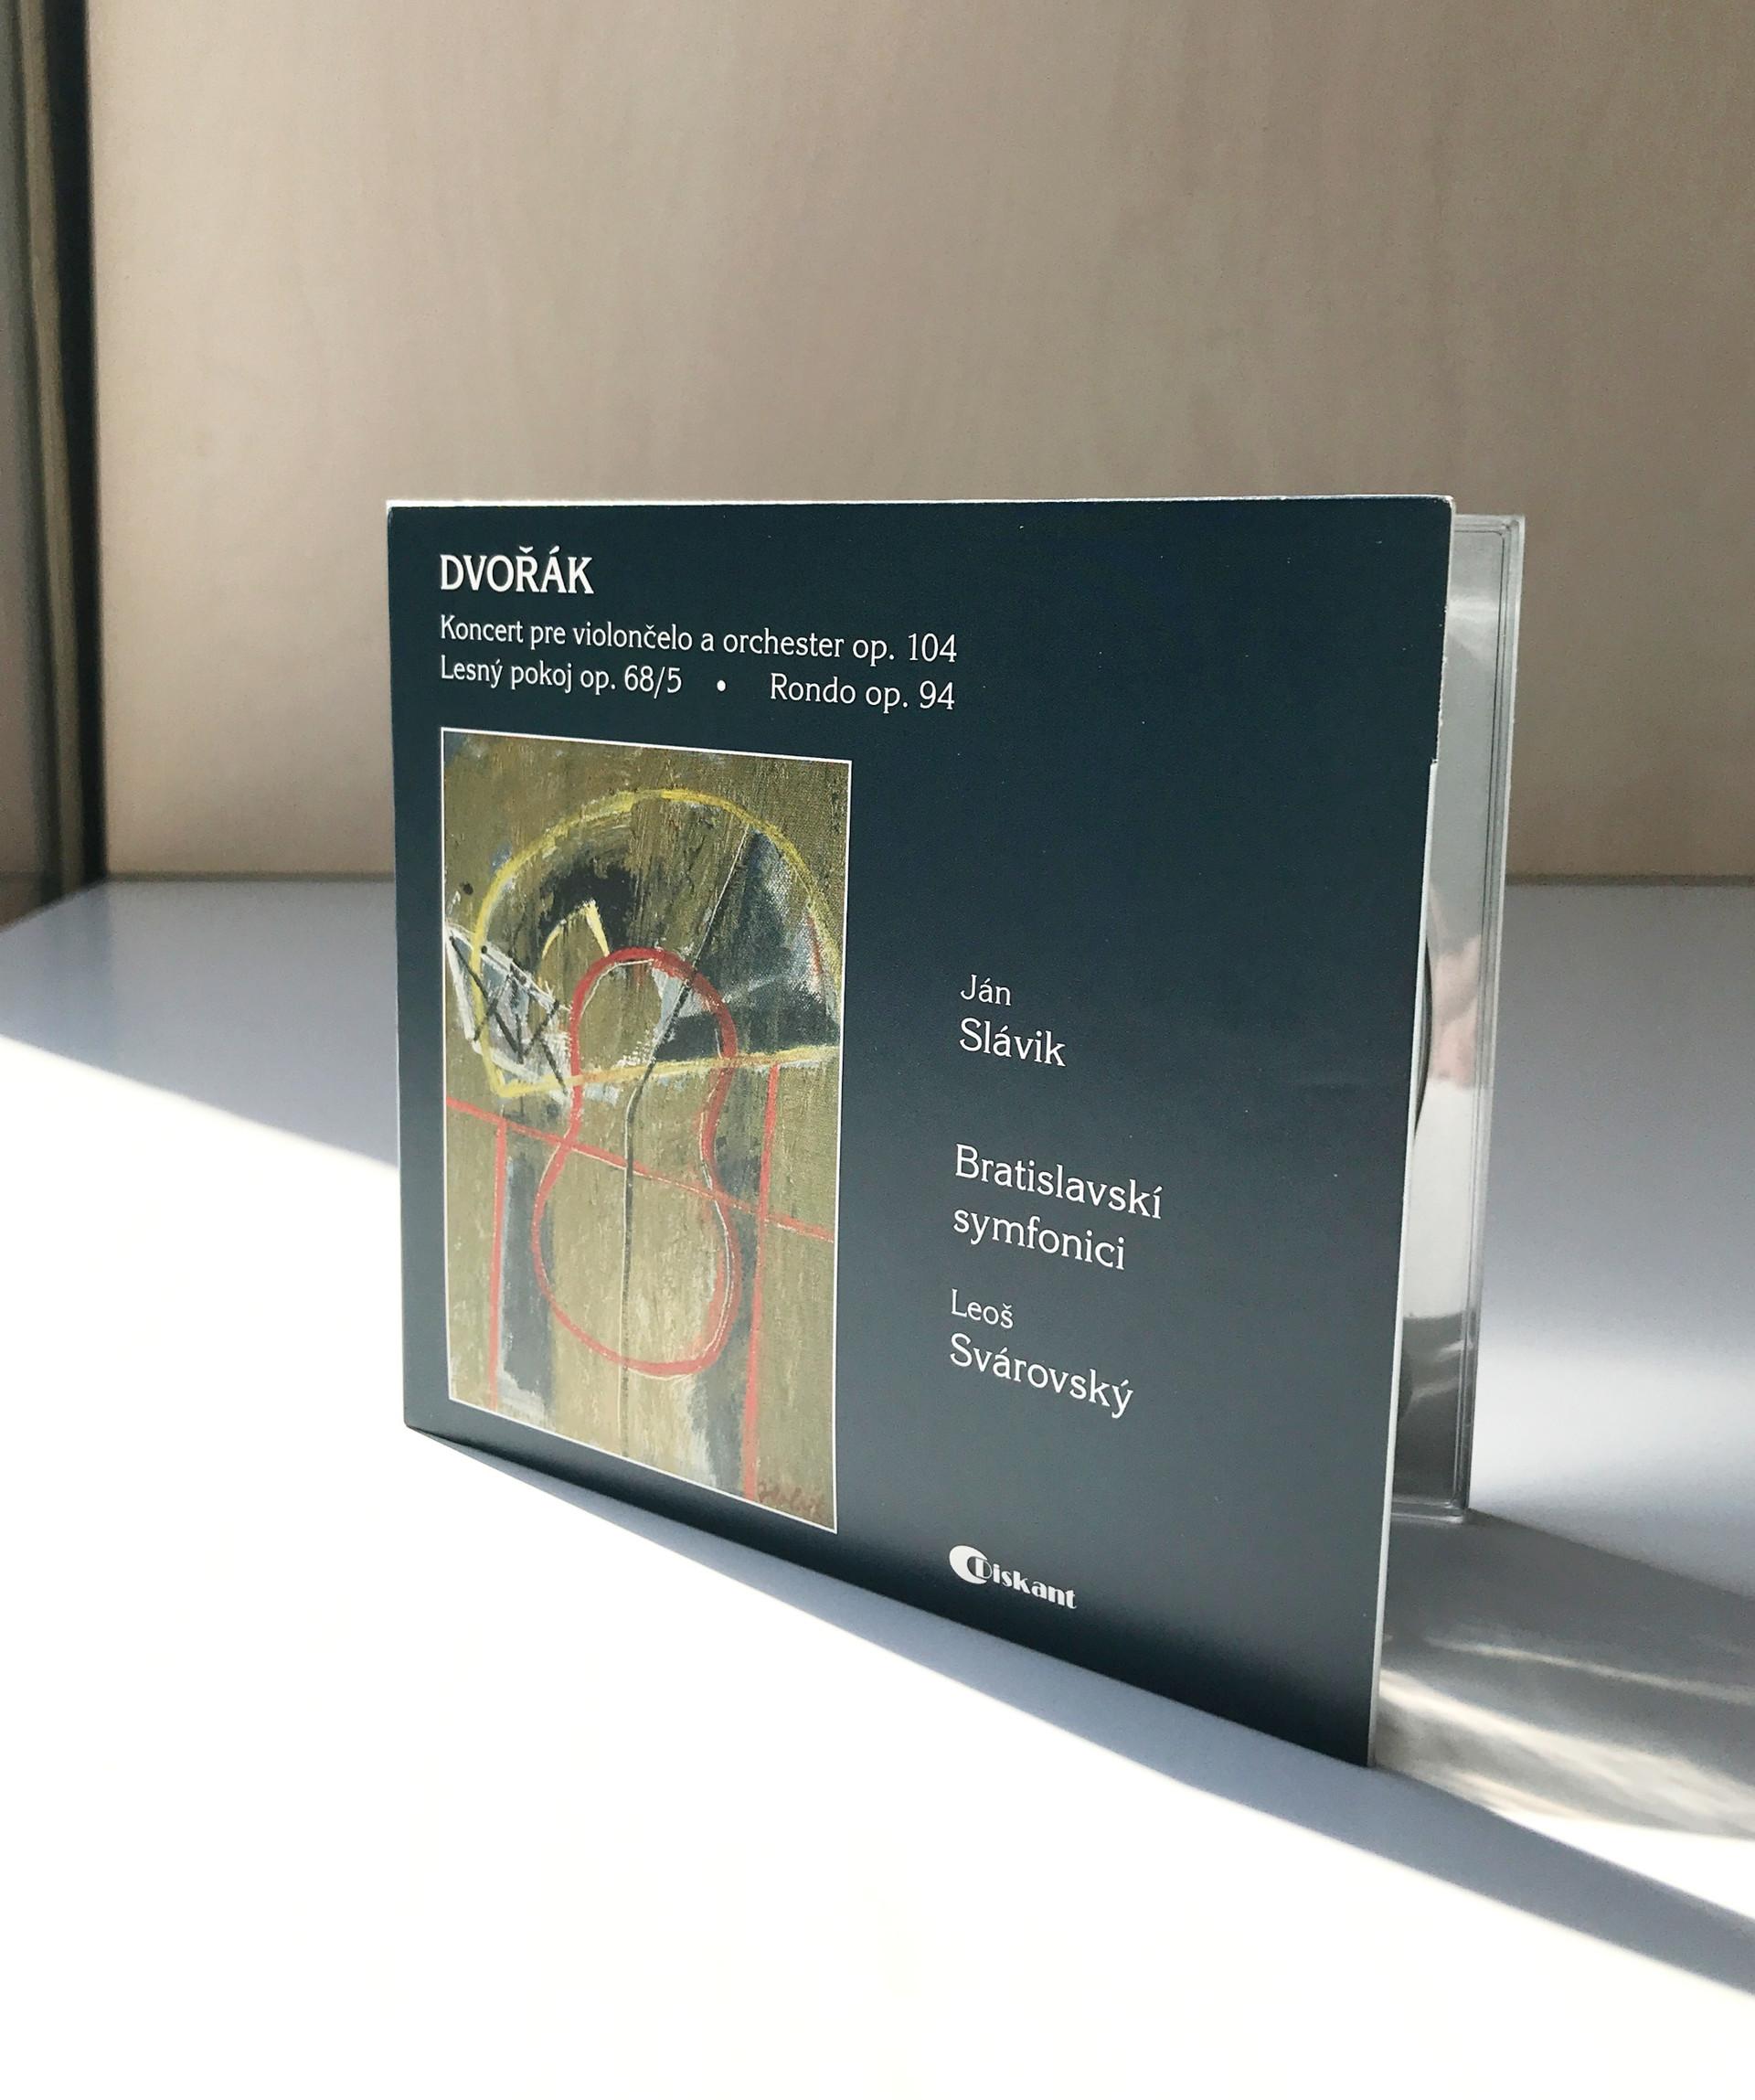 Antonín Dvořák: Cello works